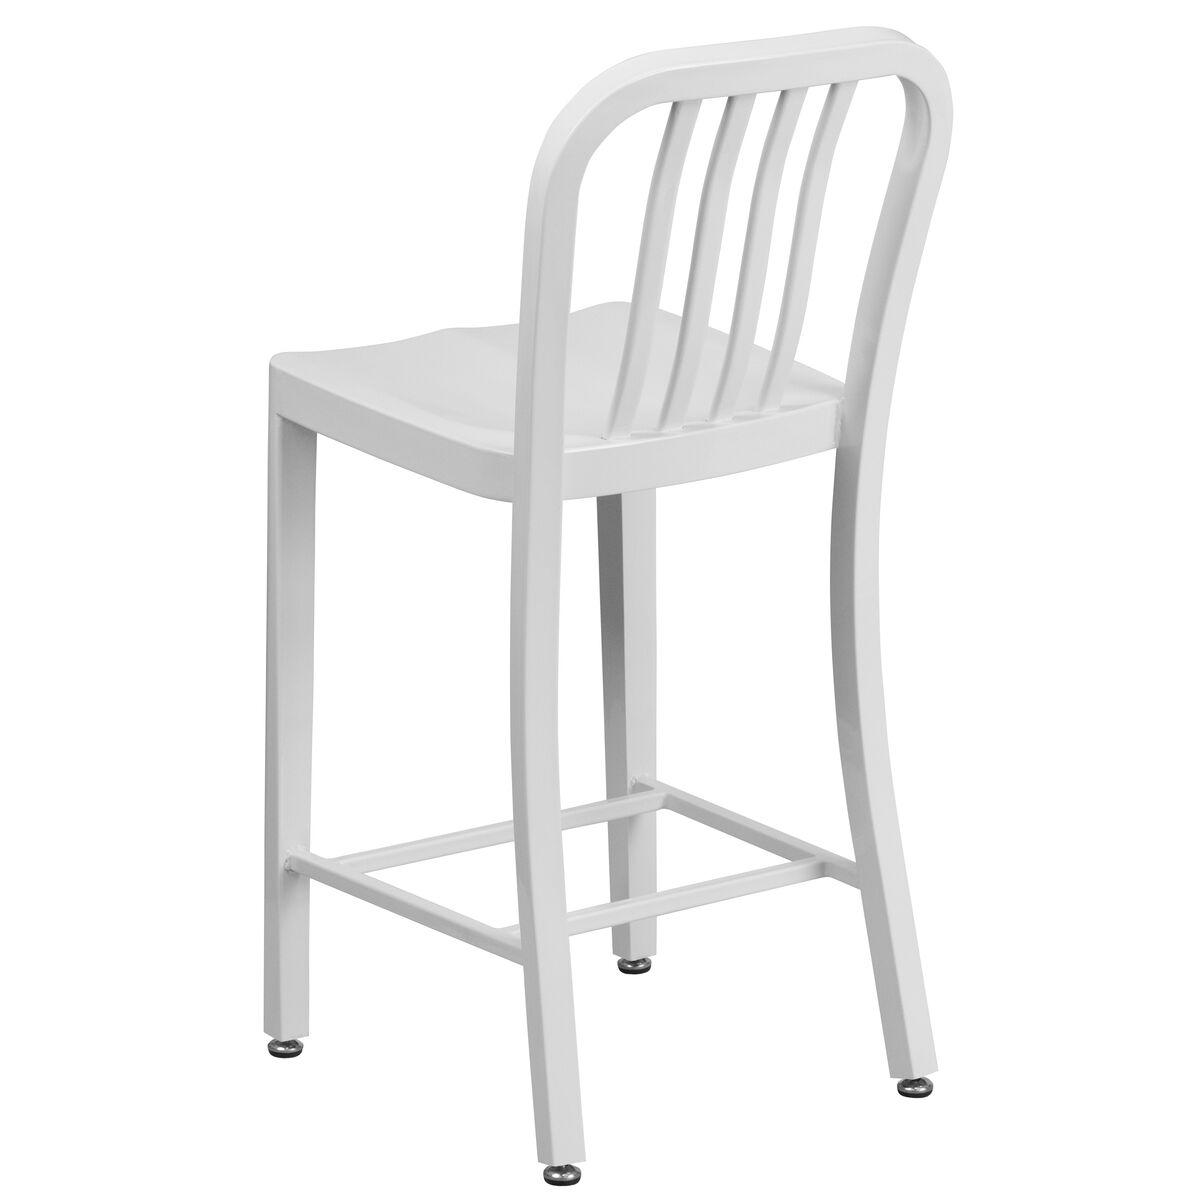 Flash Furniture 24 High White Metal Indoor Outdoor